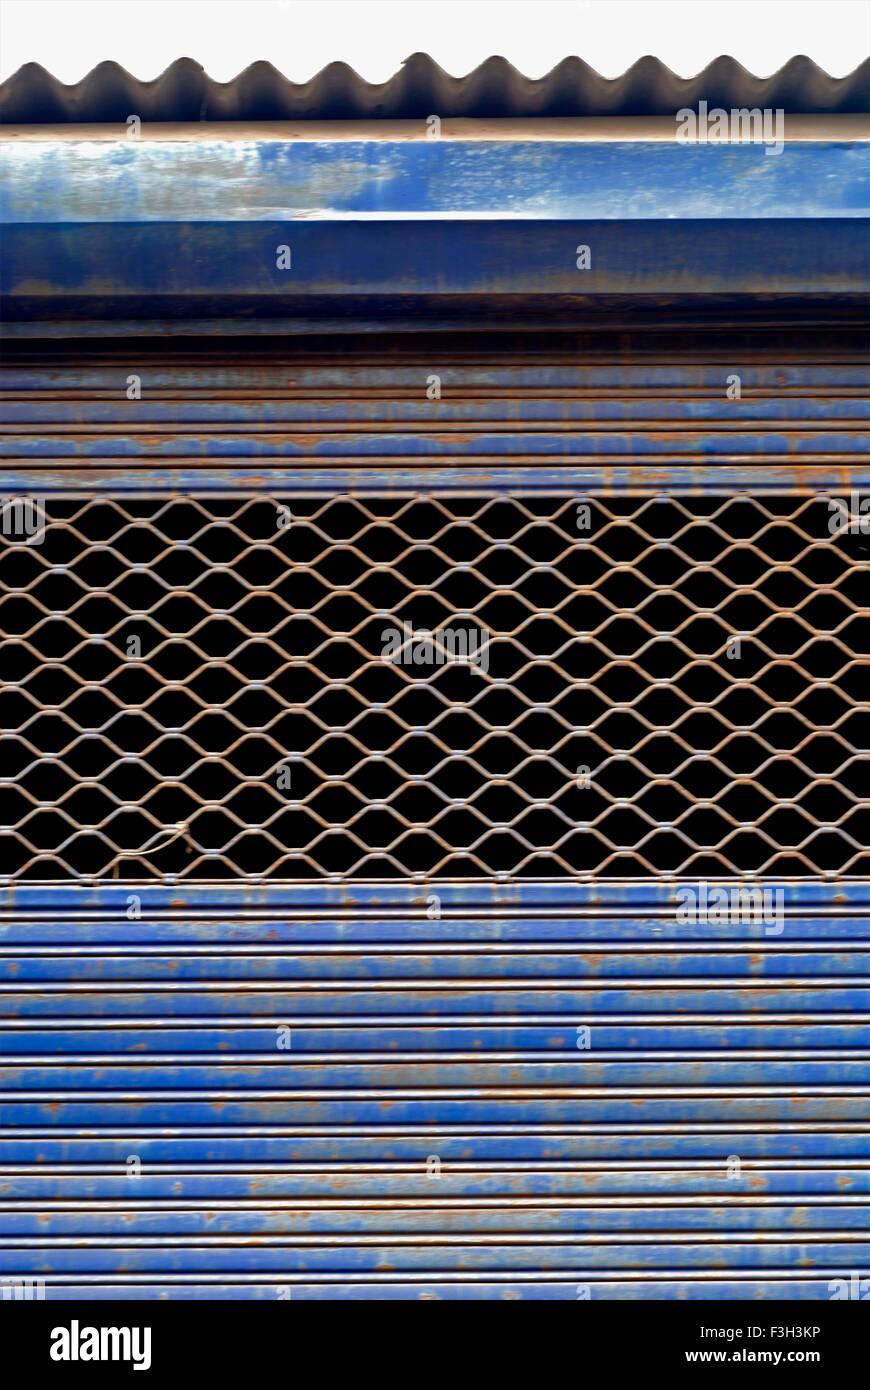 Corrugated metal sheet shutter with open grill ; Rajkot ; Gujarat ; India - Stock Image